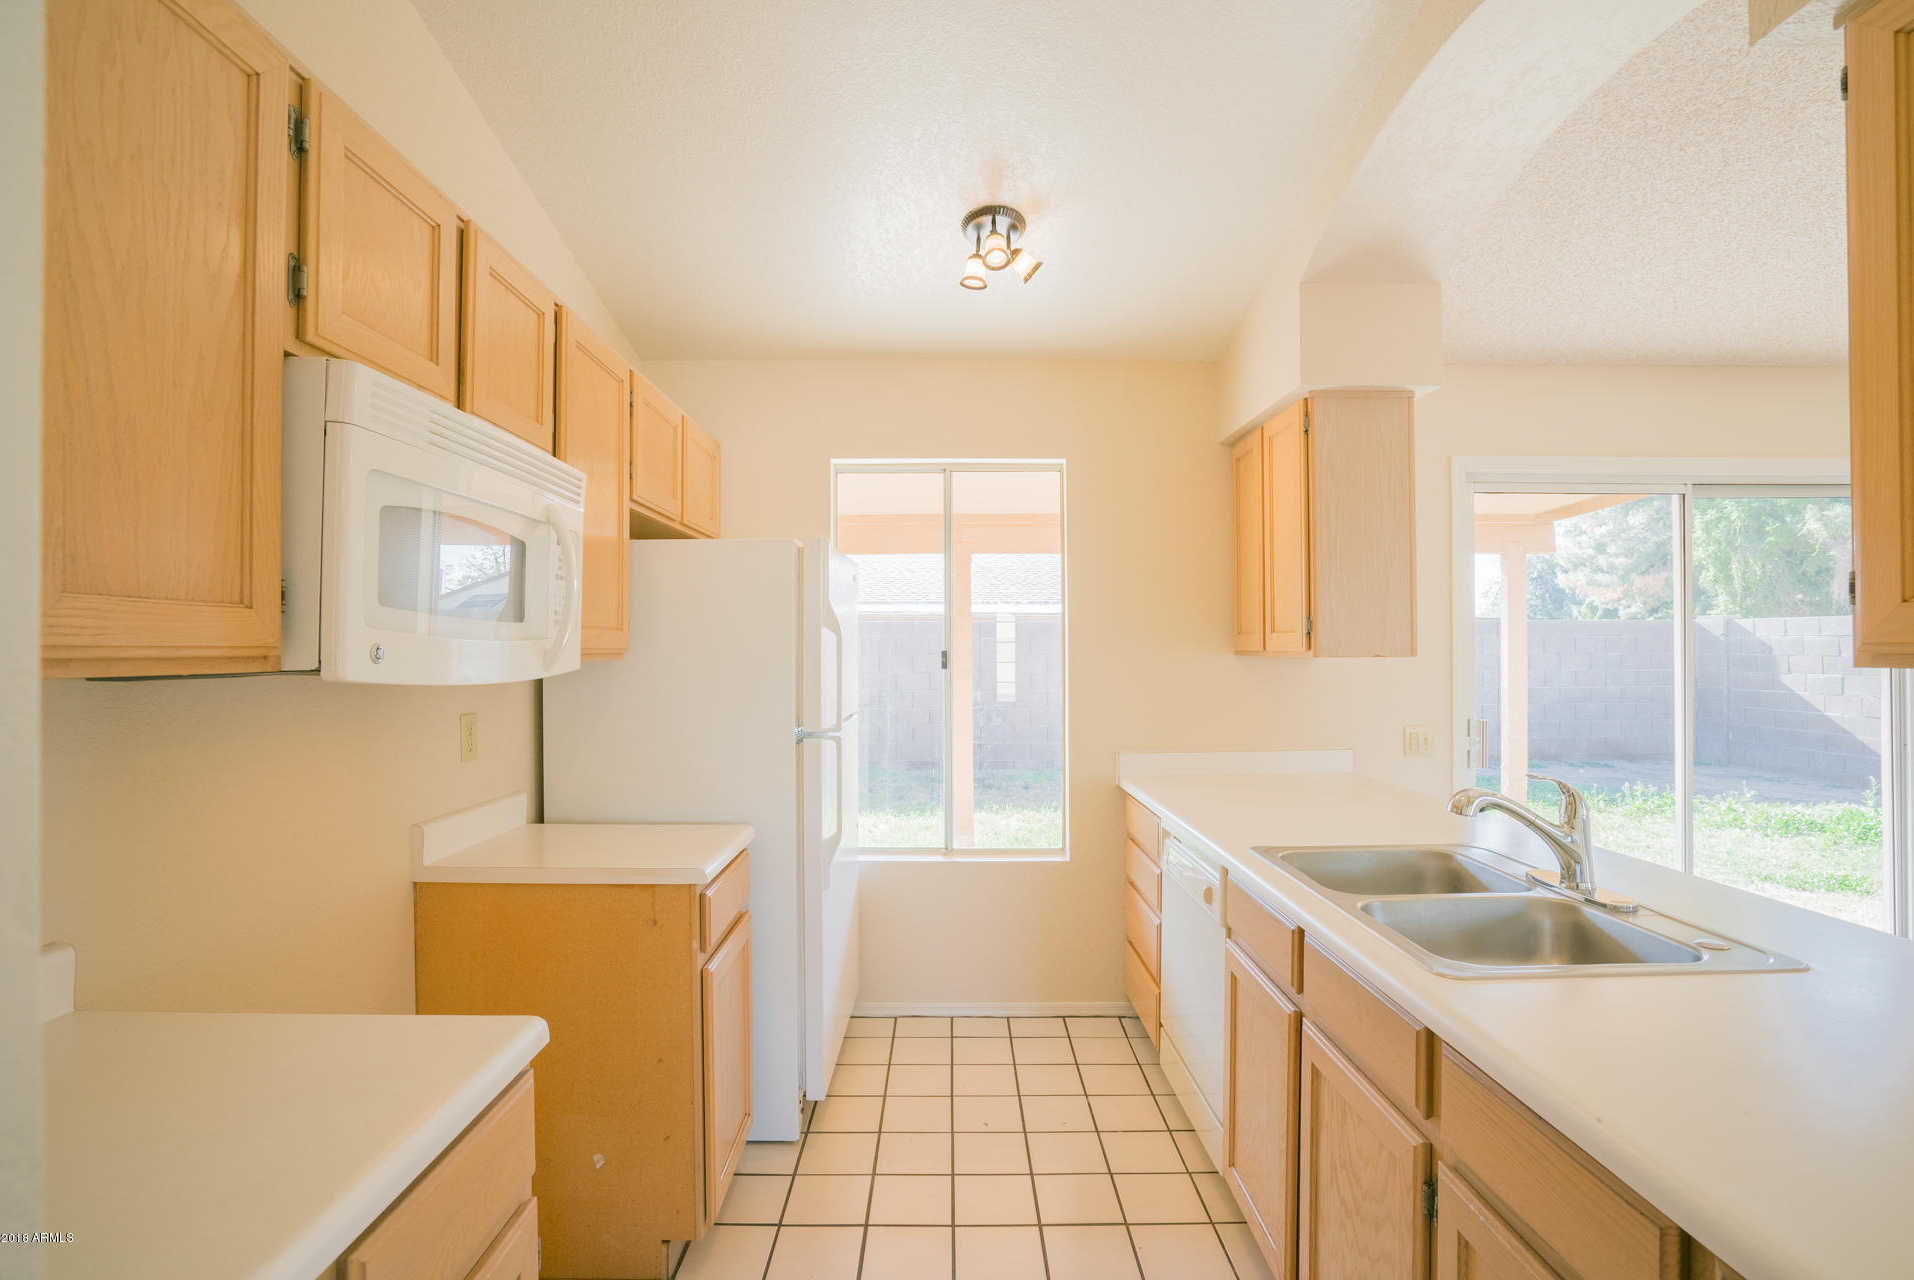 $200,000 - 3Br/2Ba - Home for Sale in Camelback Park Lot 1-288 Tr A-d, Glendale